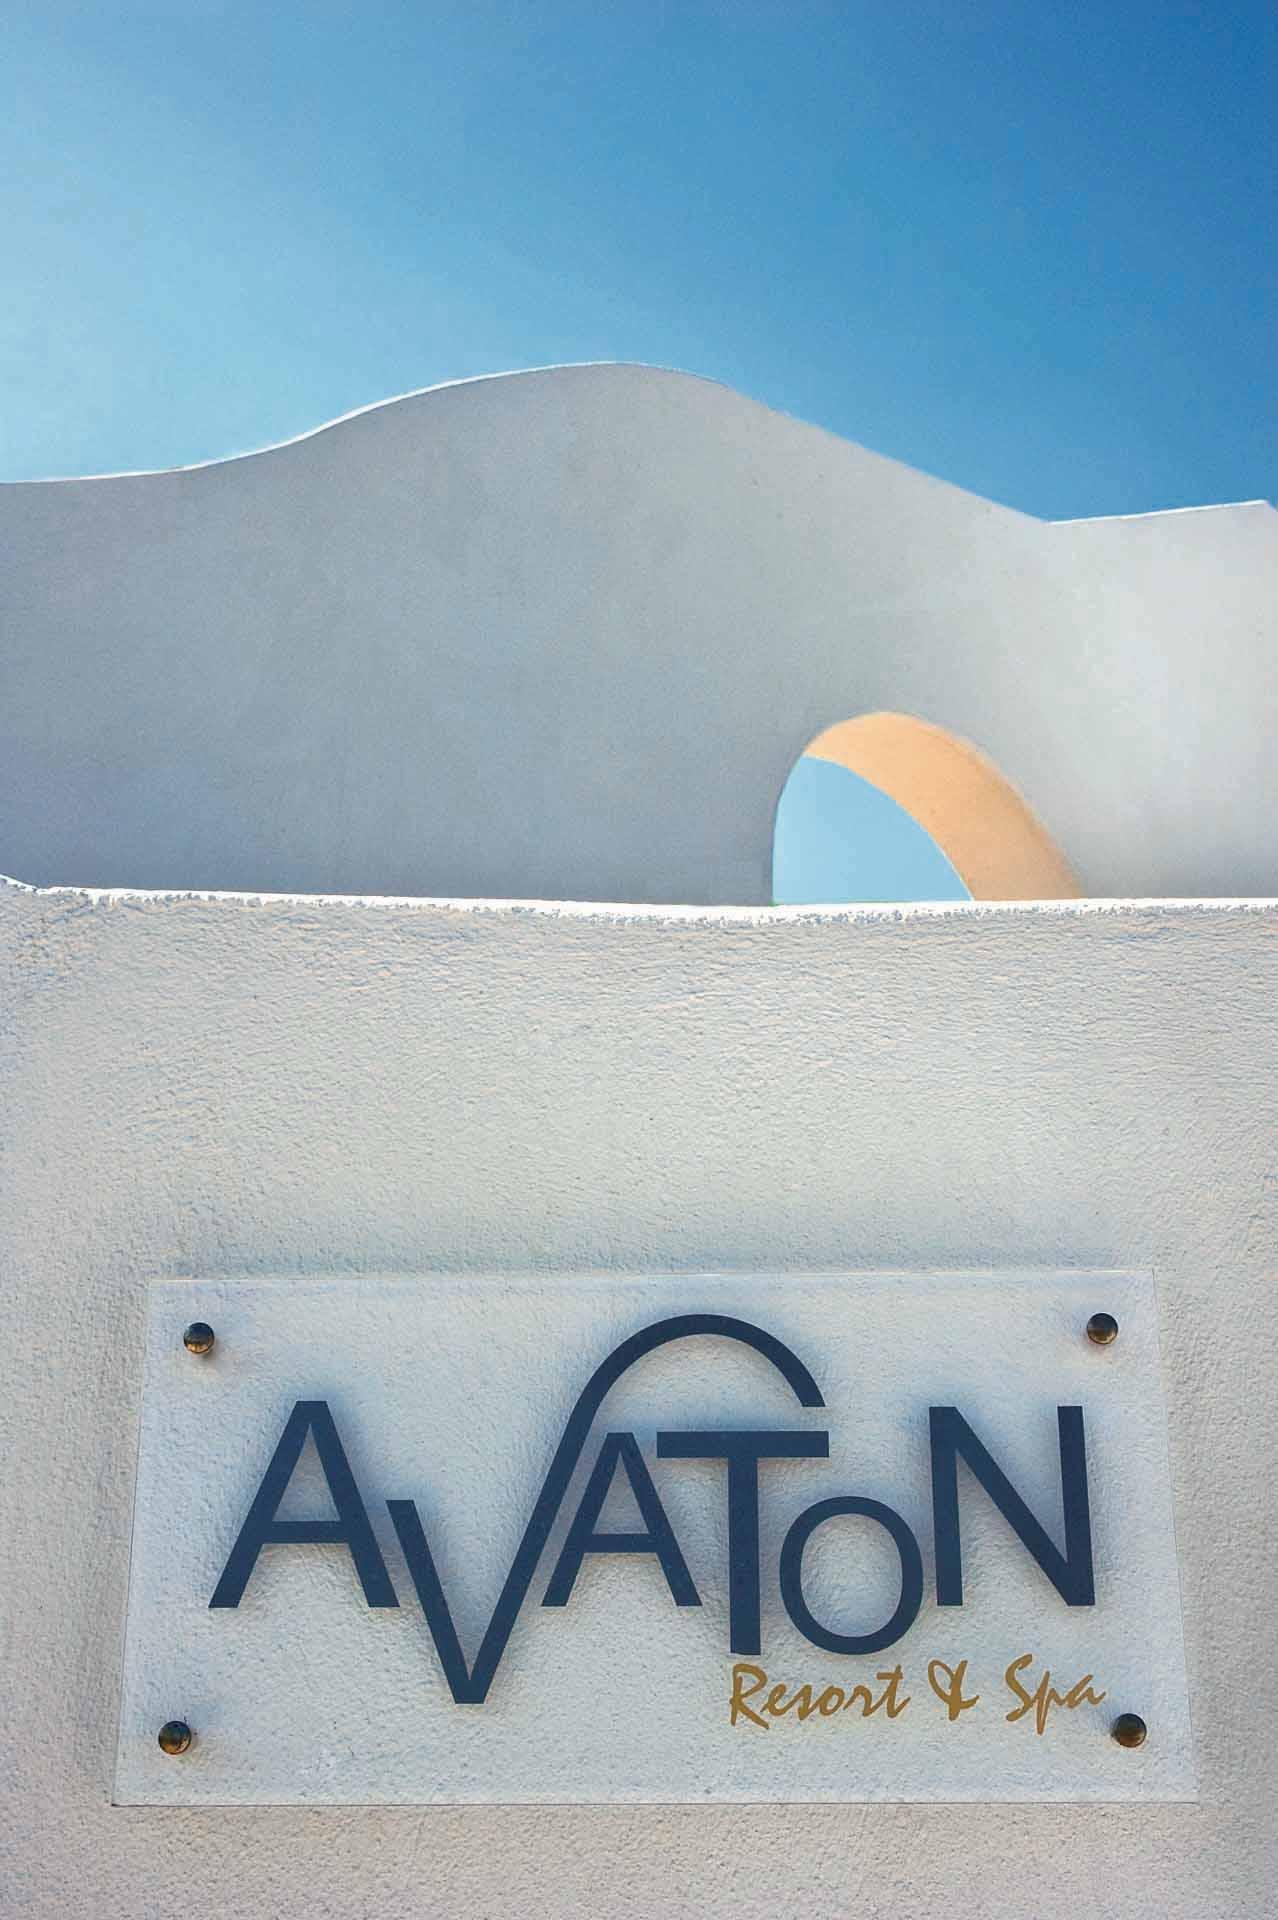 Avaton Hotel Resort & Spa Santorini Cicladi Grecia 00008